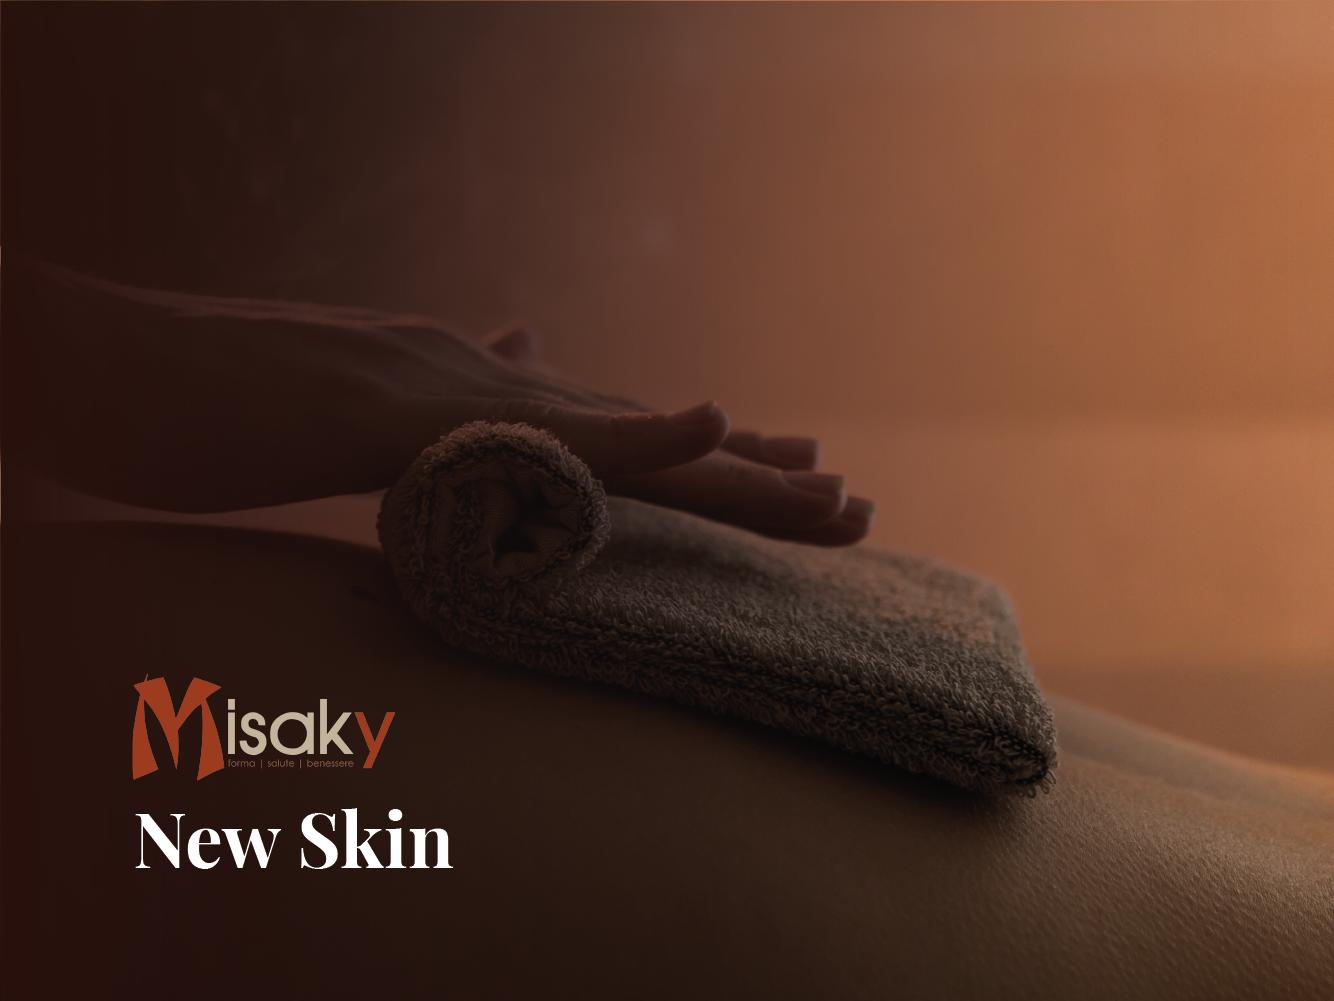 New skin - gift 1